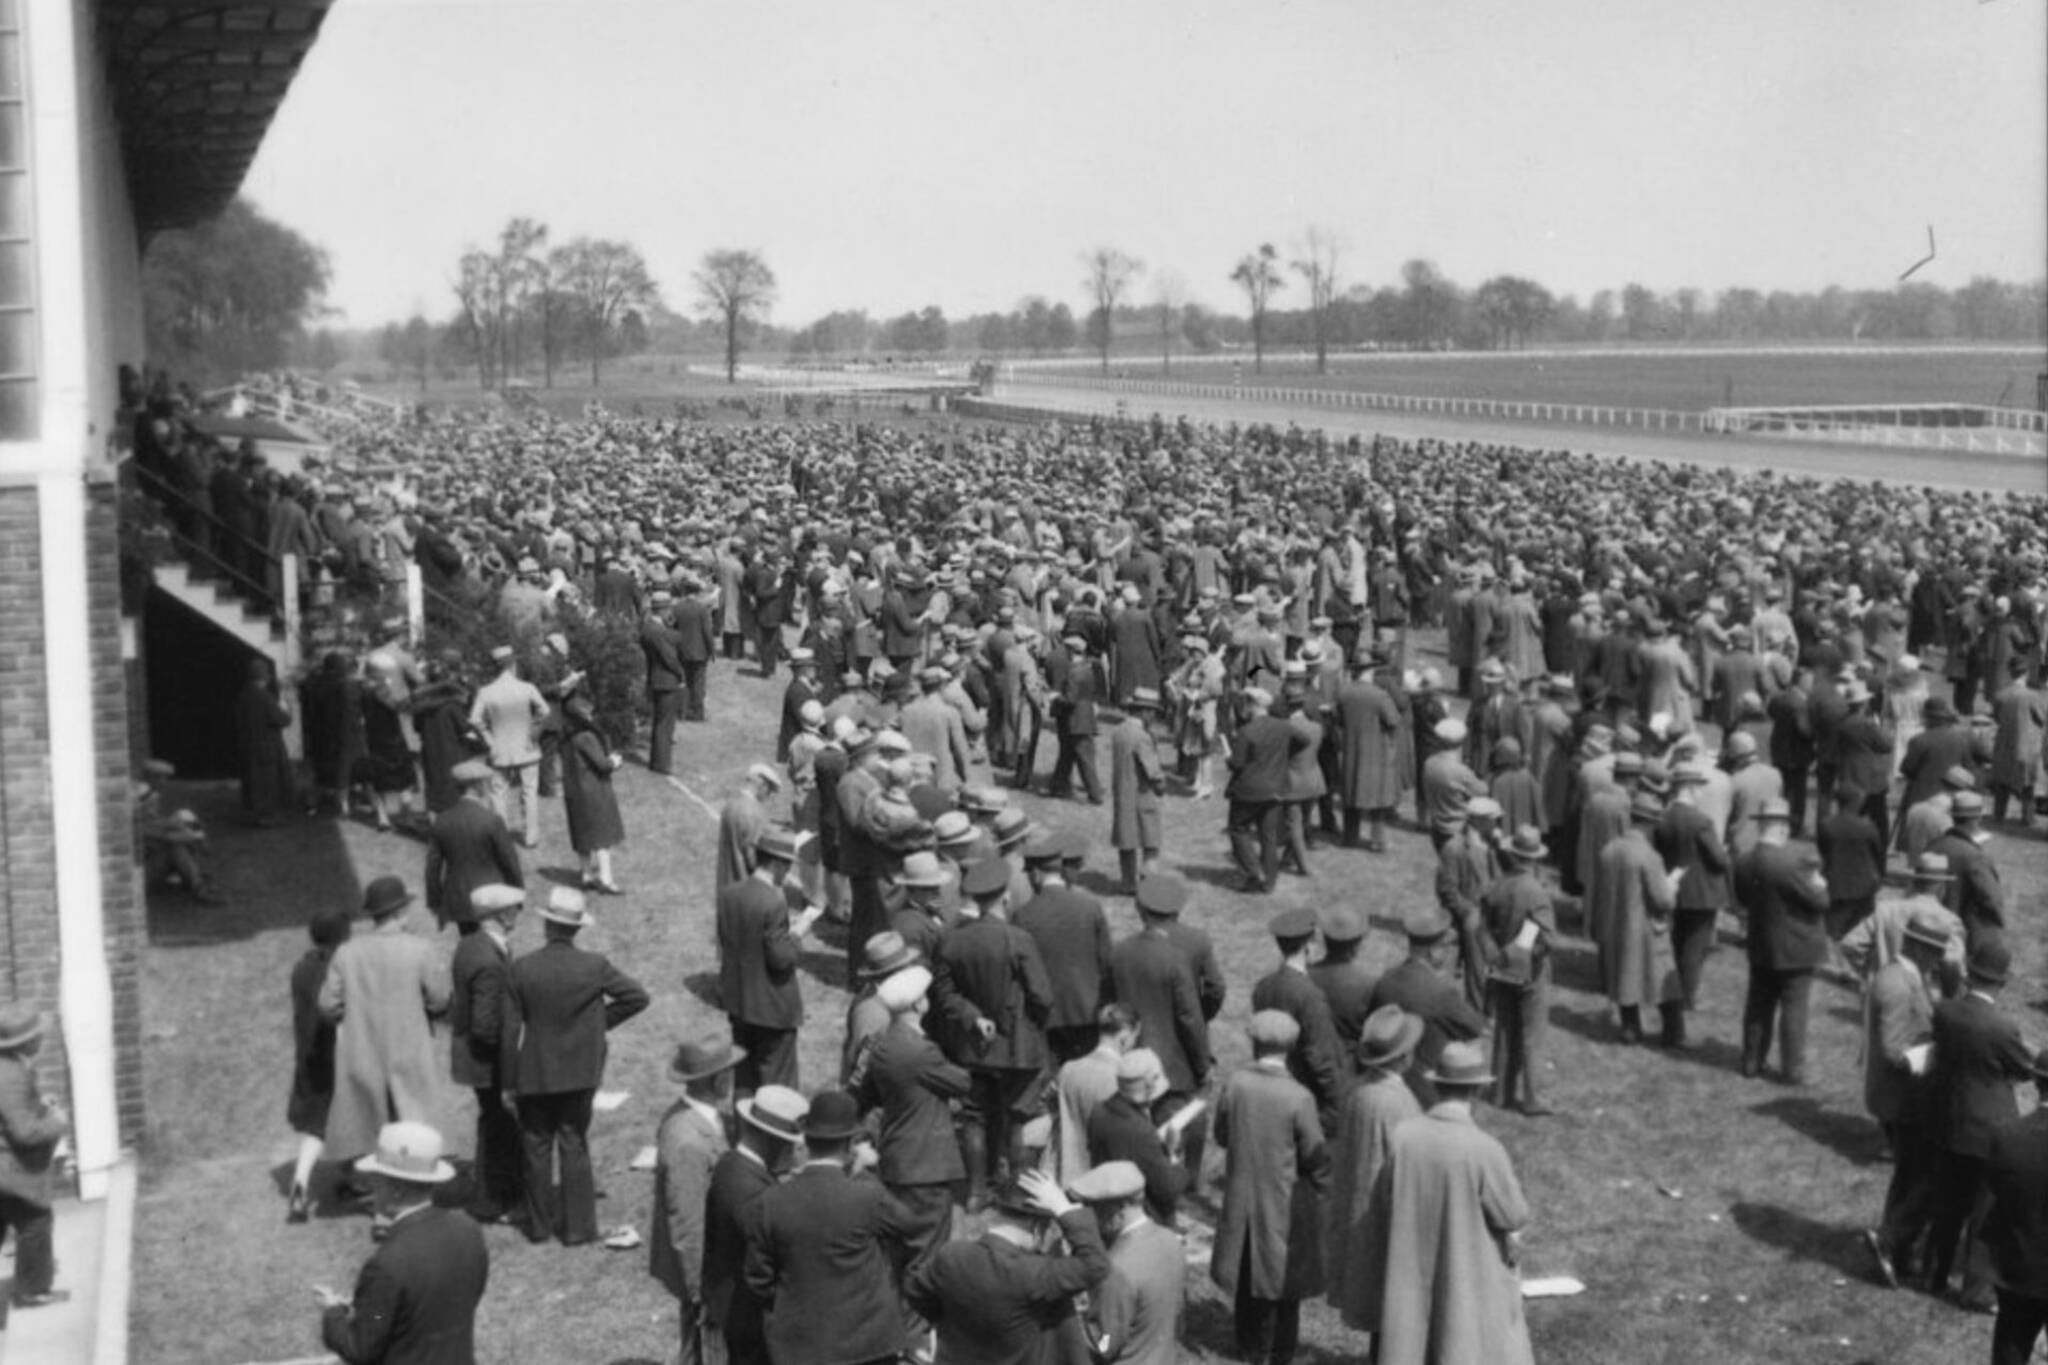 Thorncliffe Park racetrack